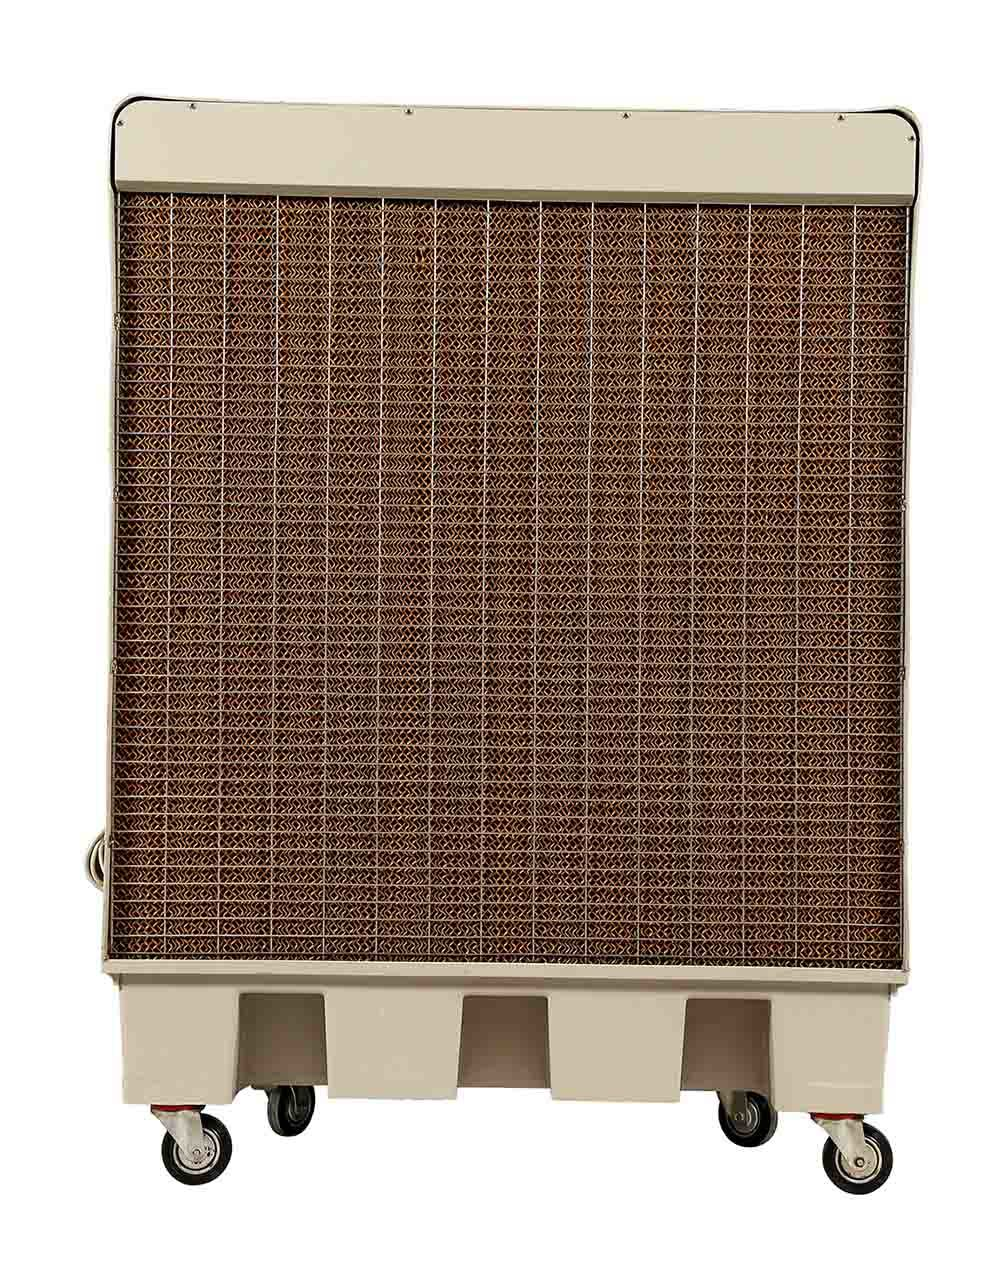 Cooling Fan/ Evaporative Air Cooler/ Evaporative Cooling Fan